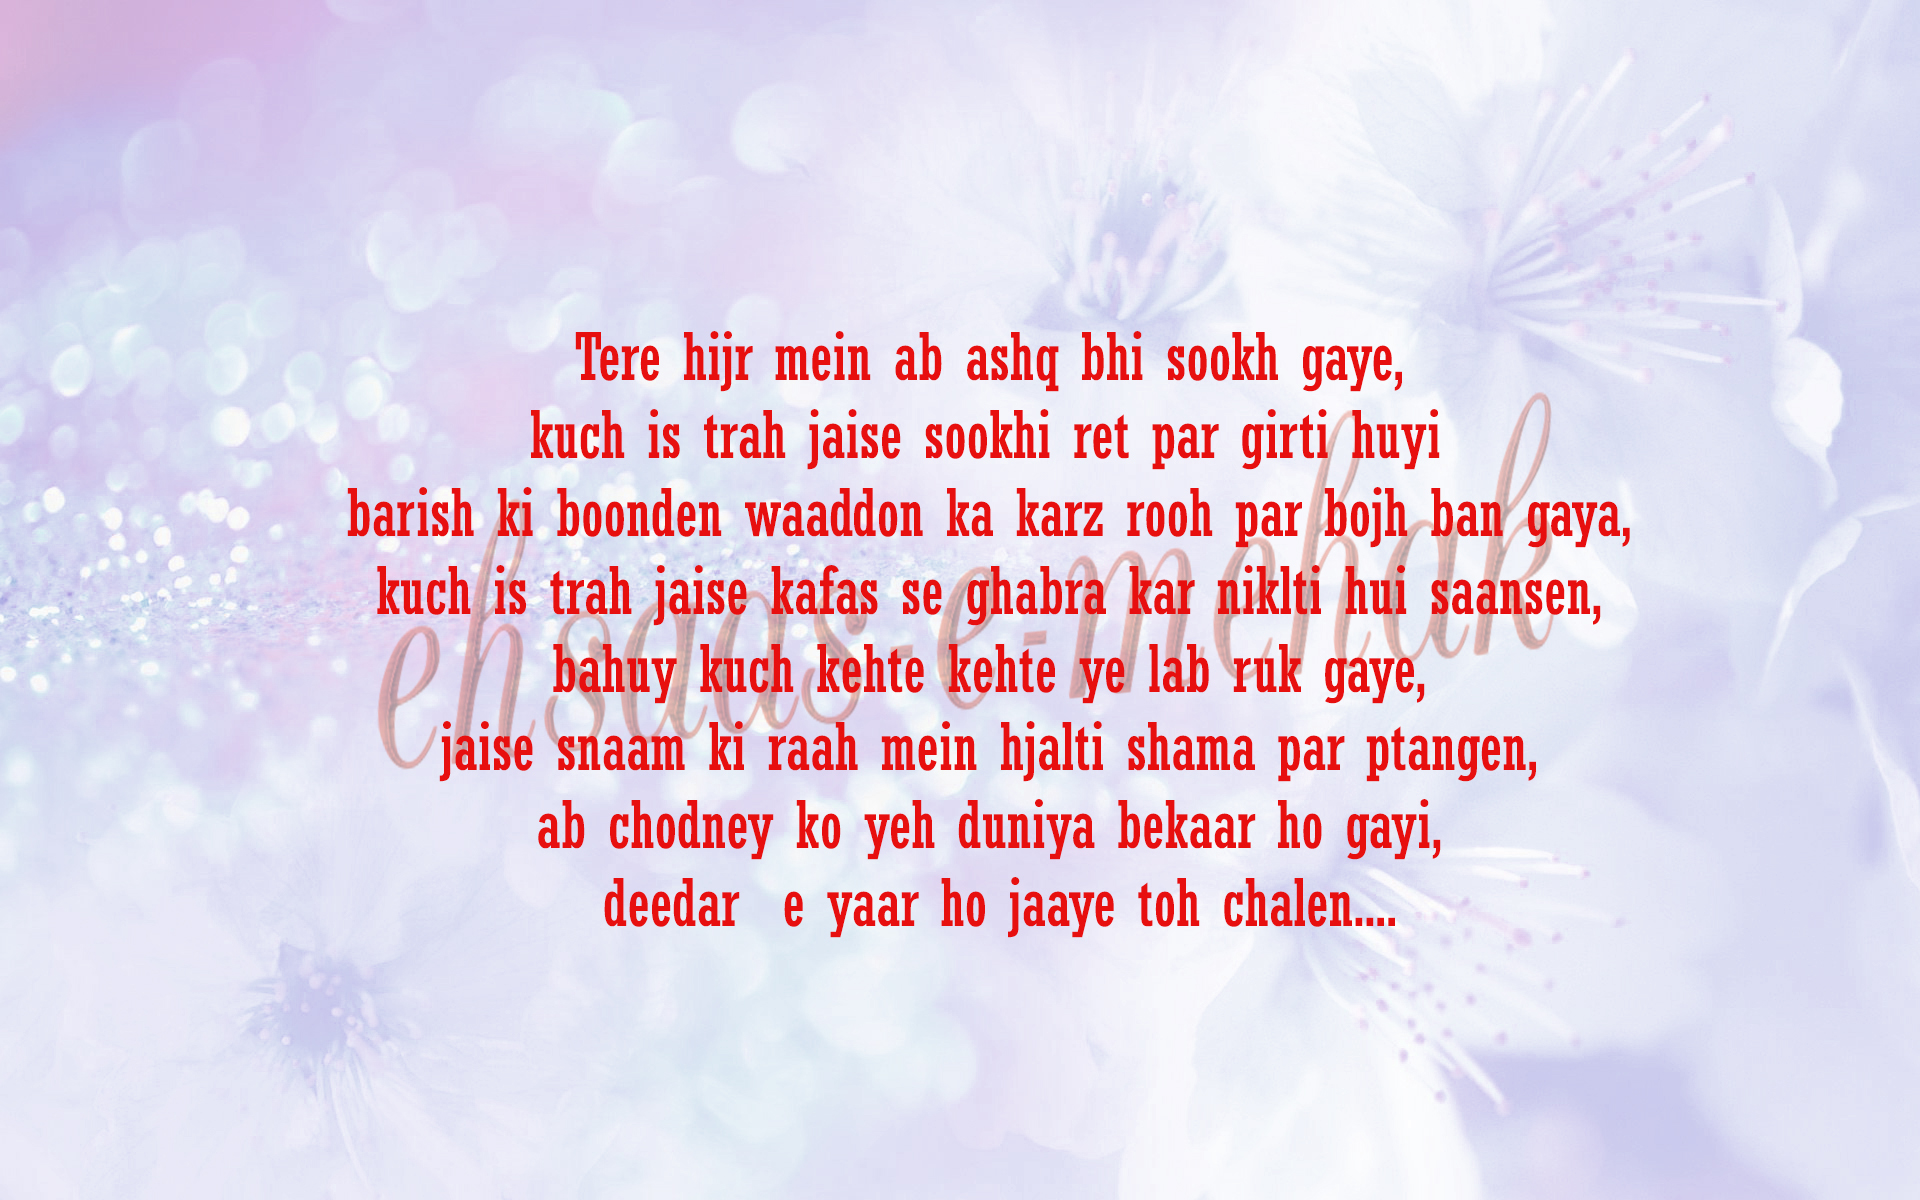 Tere hijr mein ab ashq bhi sookh gaye